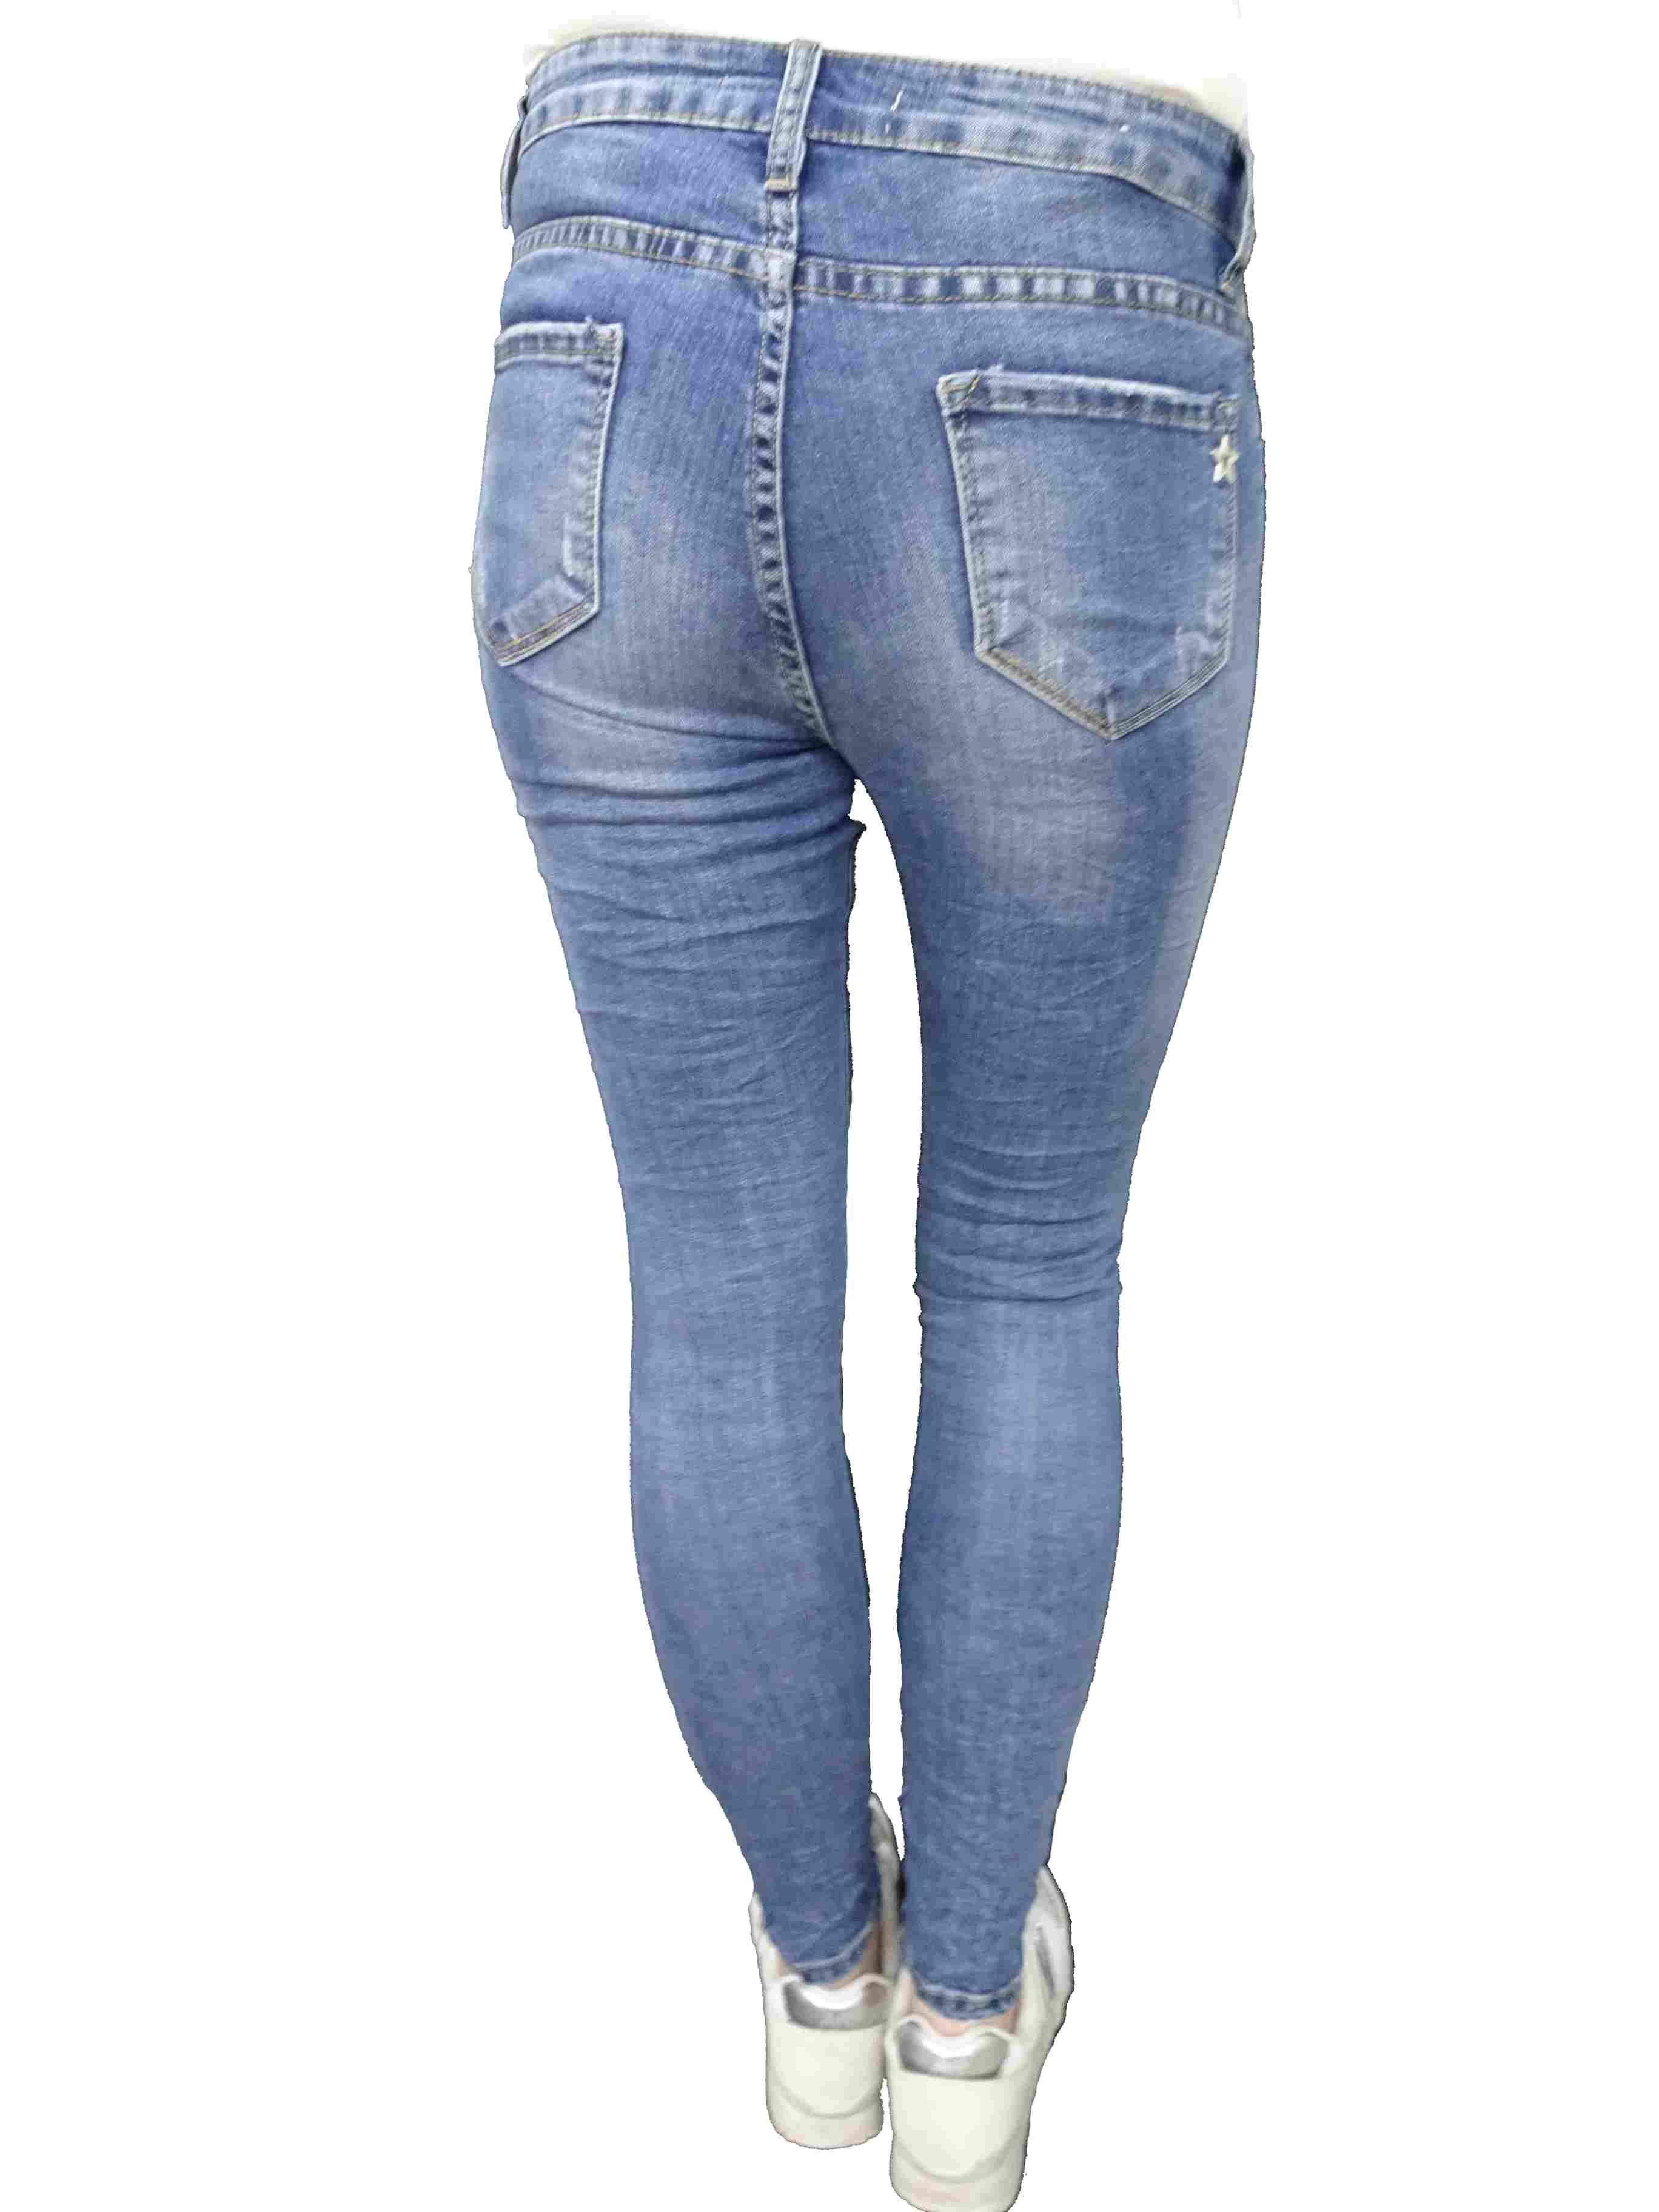 fb78179b68bd Lexxury Jewelly Baggy Boyfriend Damen Stretch Hose Jeans offene ...